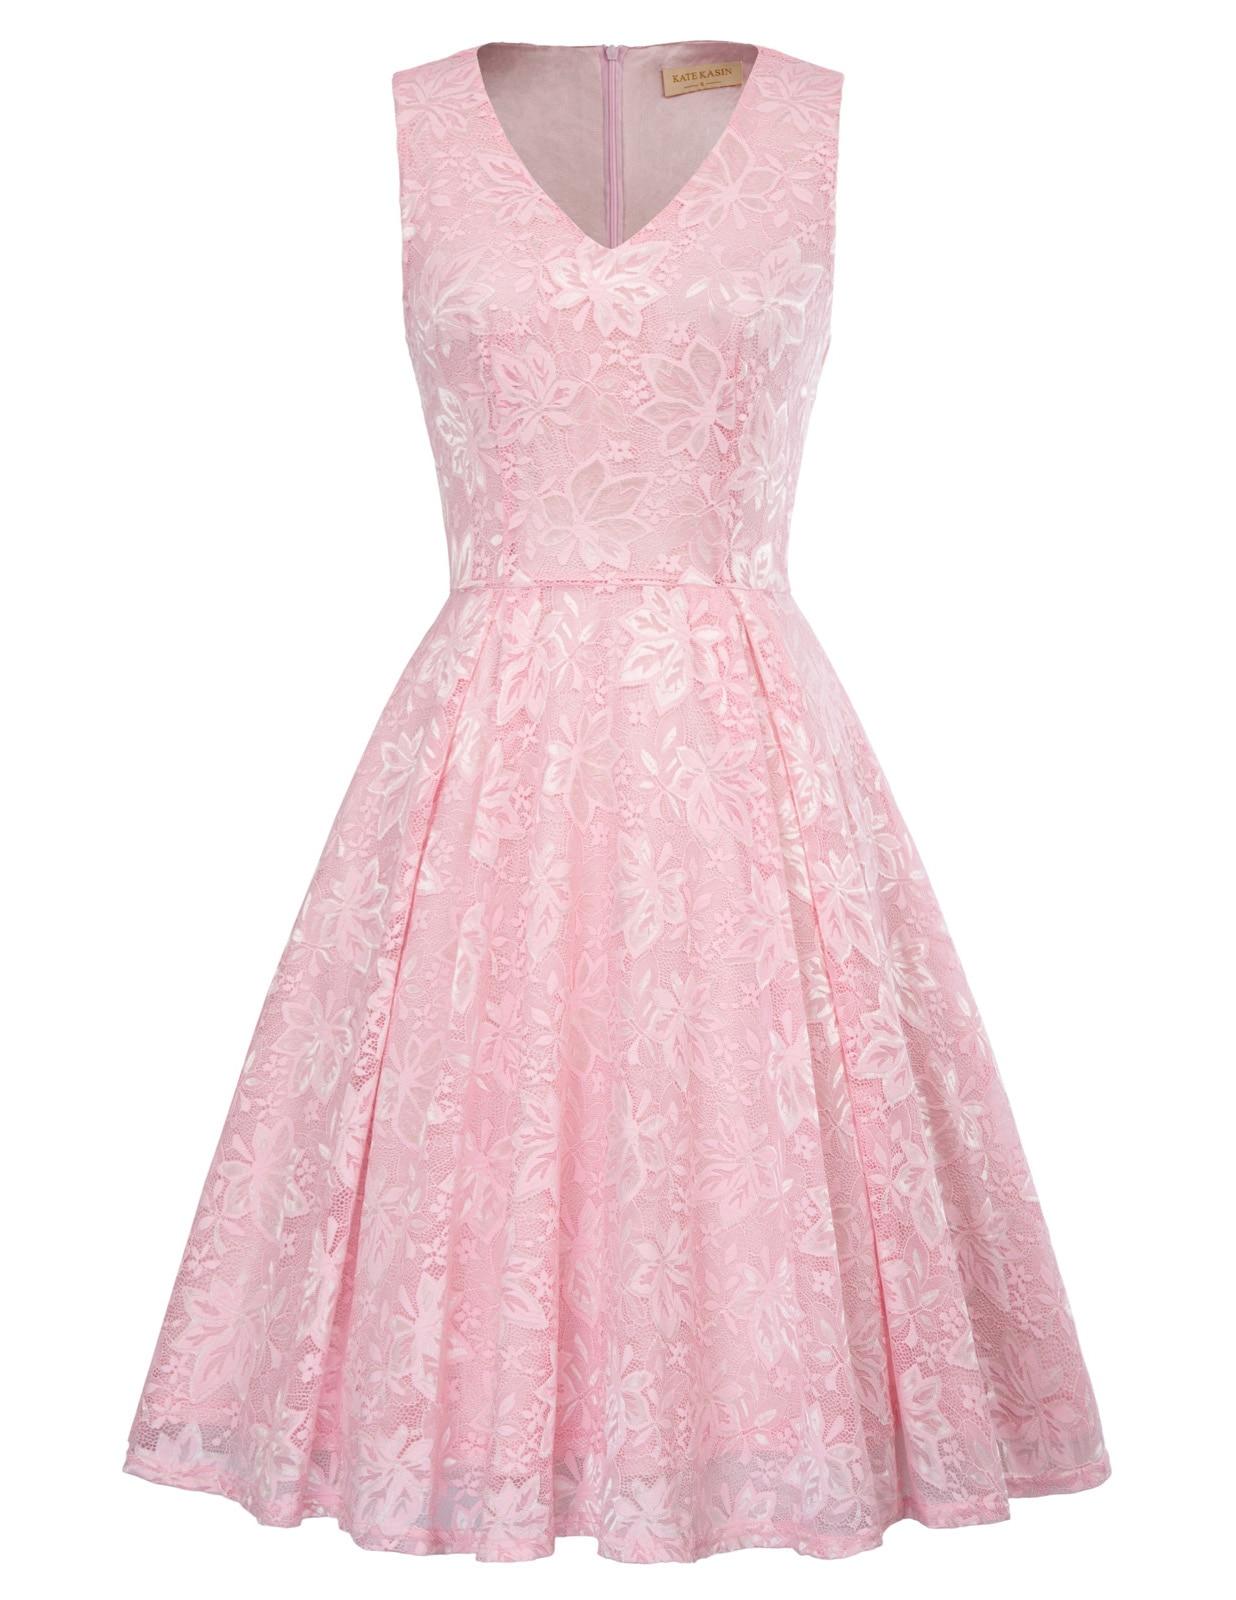 plus size women dress retro vintage elegant Sleeveless V-Neck Party Flared A-Line Lace Dress